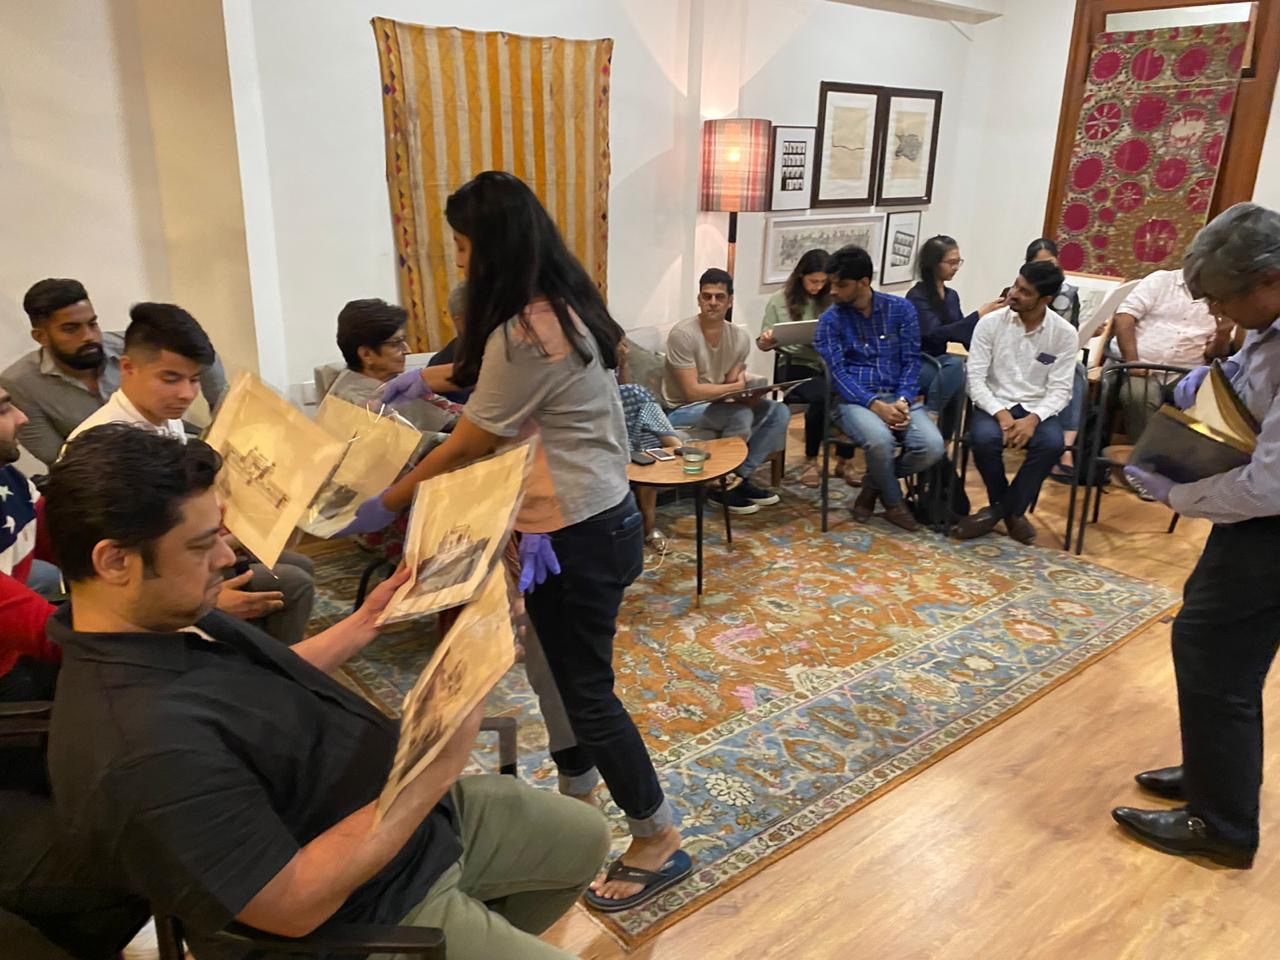 Clay Architecture & Interiors - Delhi, Delhi Diaries